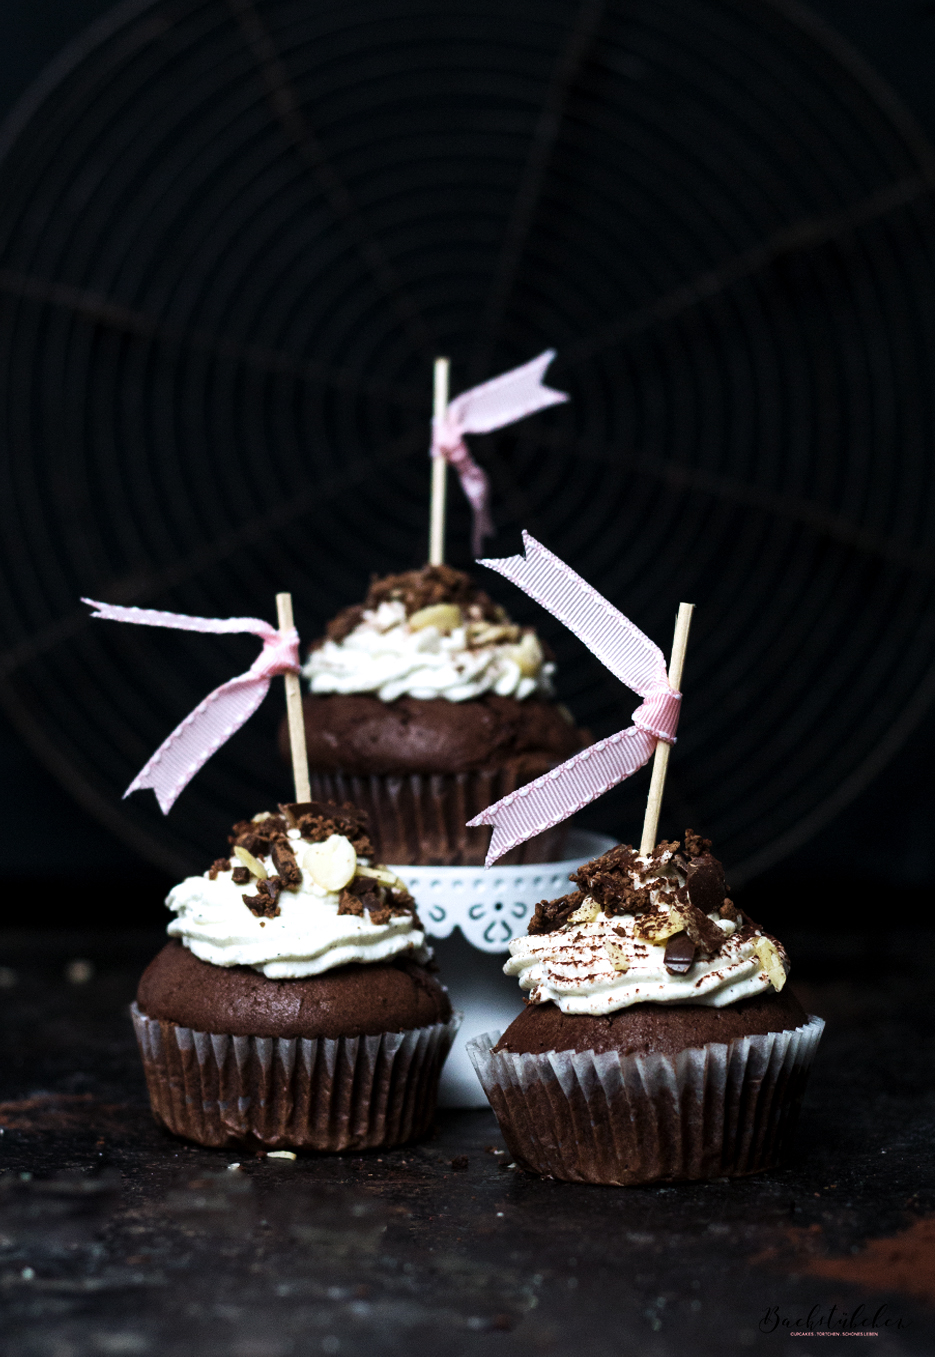 chocoholic-cupcakes5.jpg